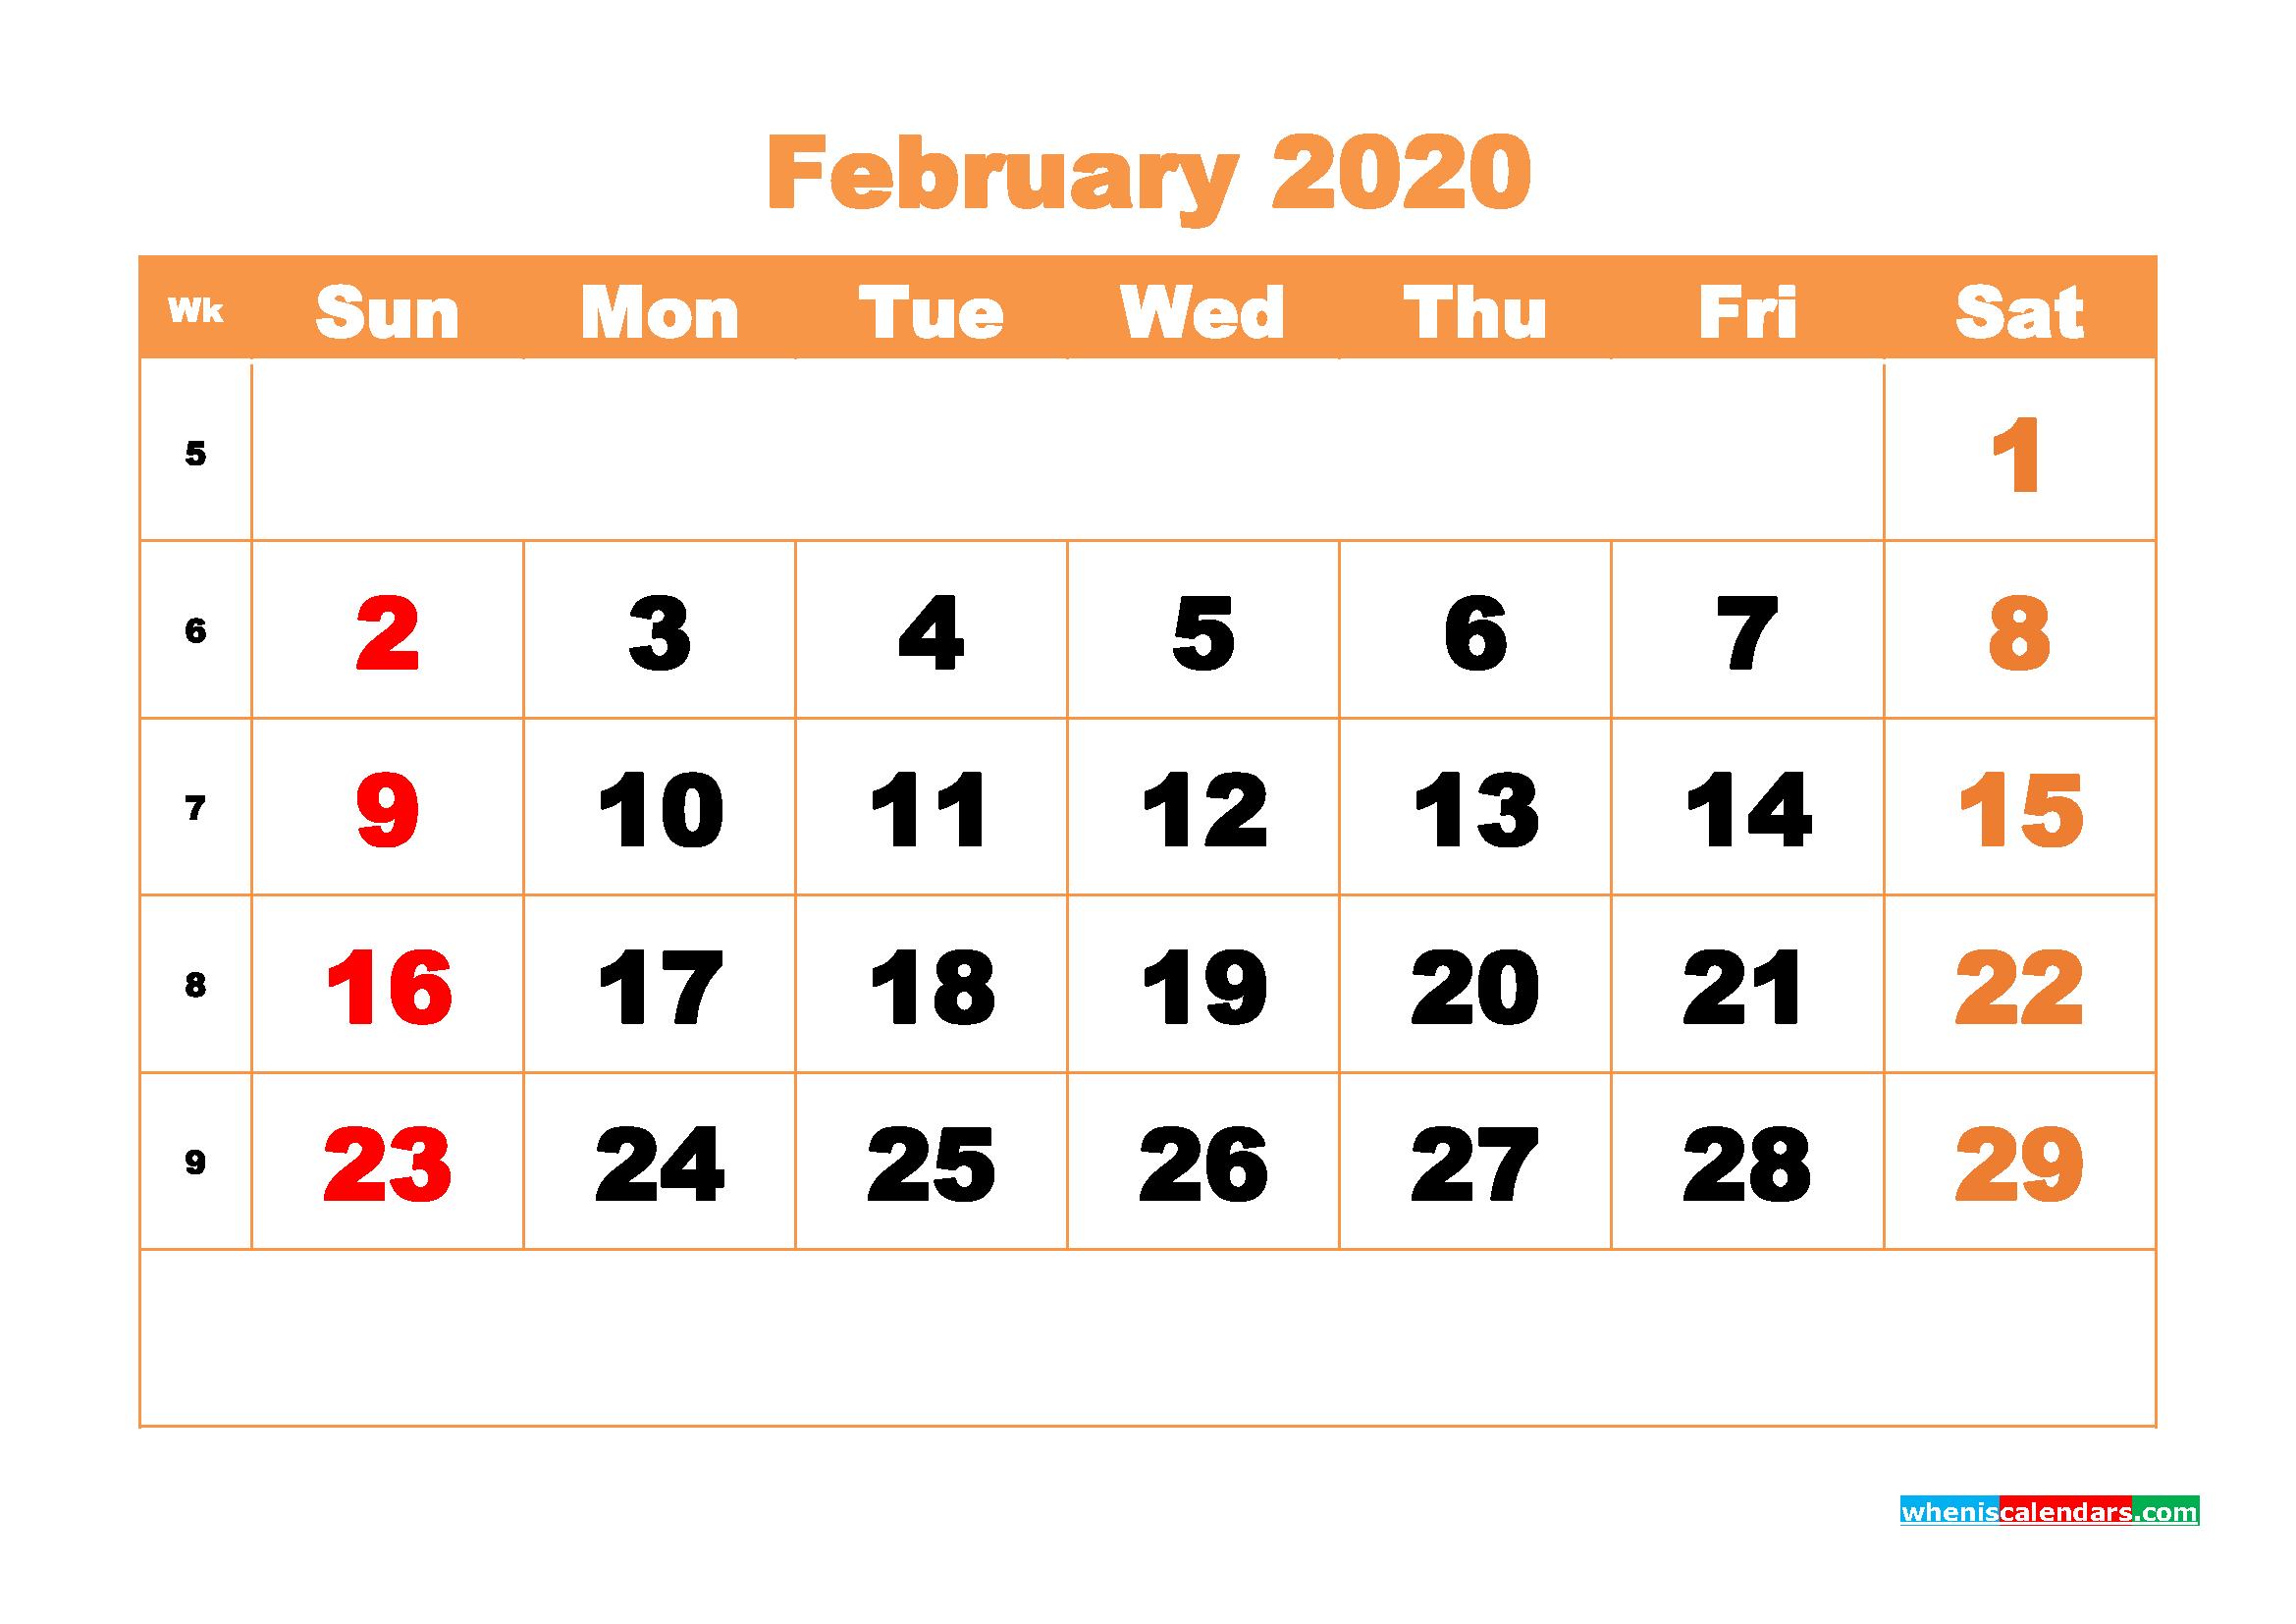 February 2020 Blank Calendar Printable - No.m20b422